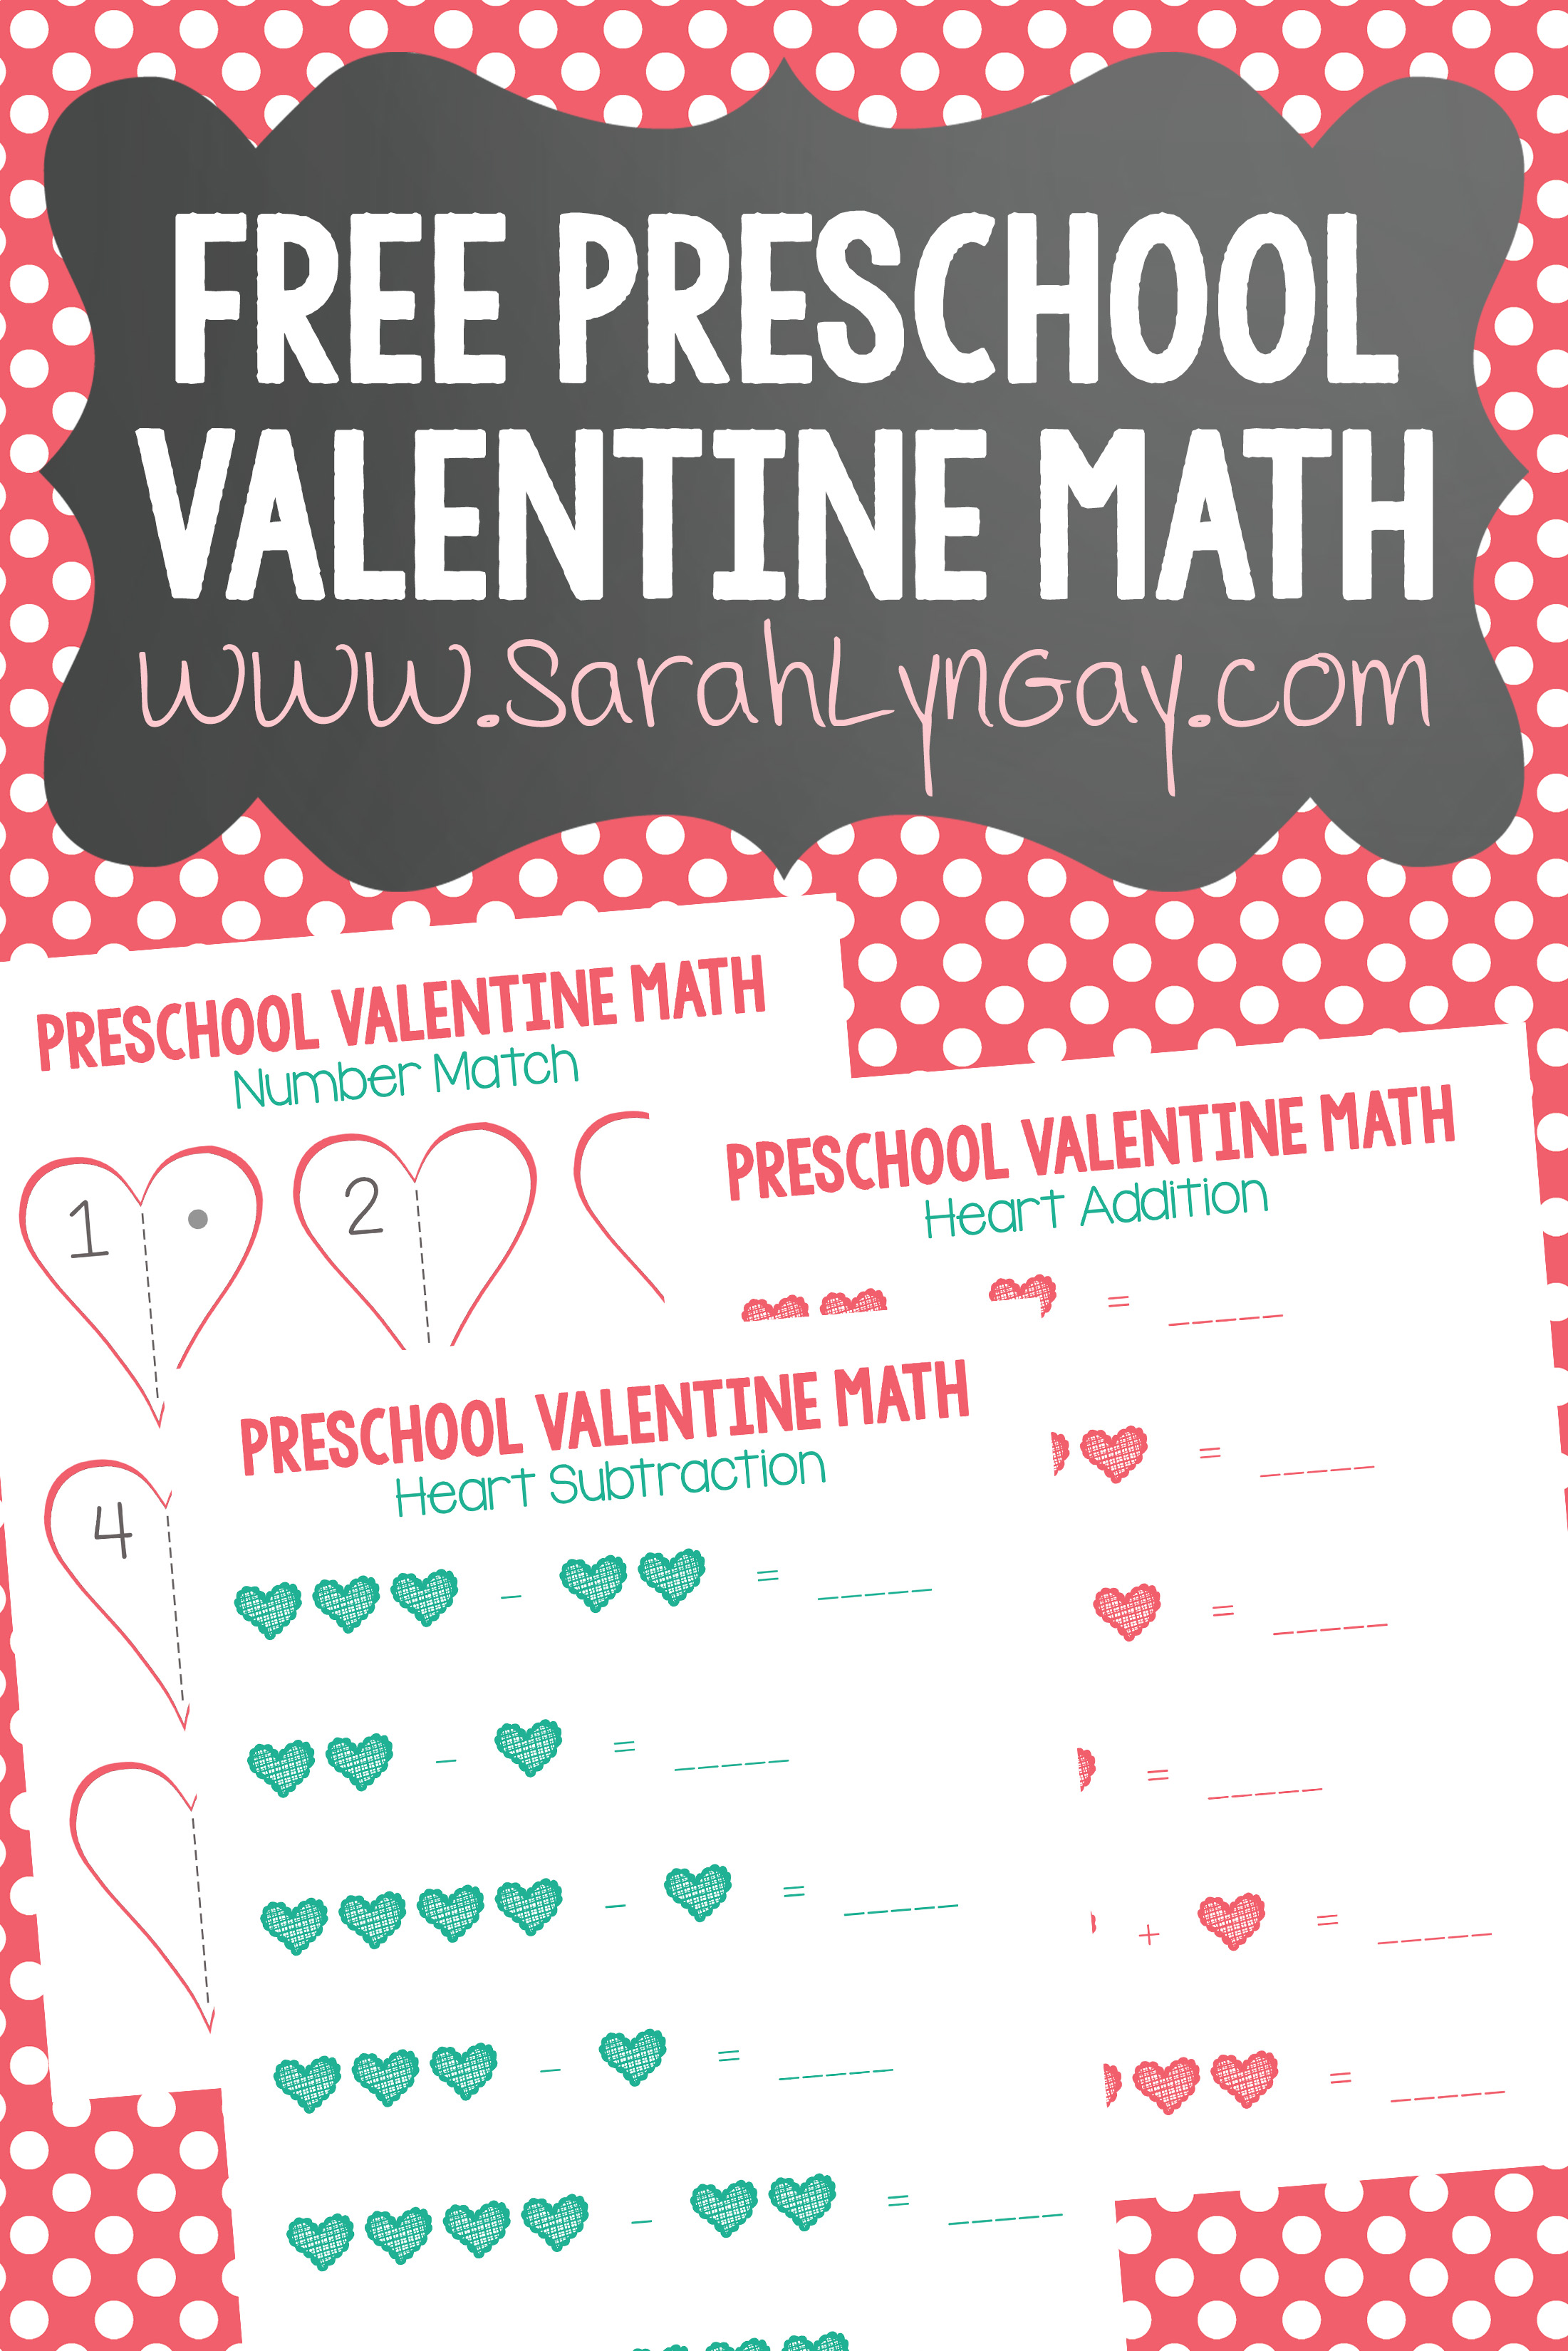 graphic about Preschool Valentine Printable Worksheets known as Preschool Valentine Math Totally free Printable Worksheet - Sarah